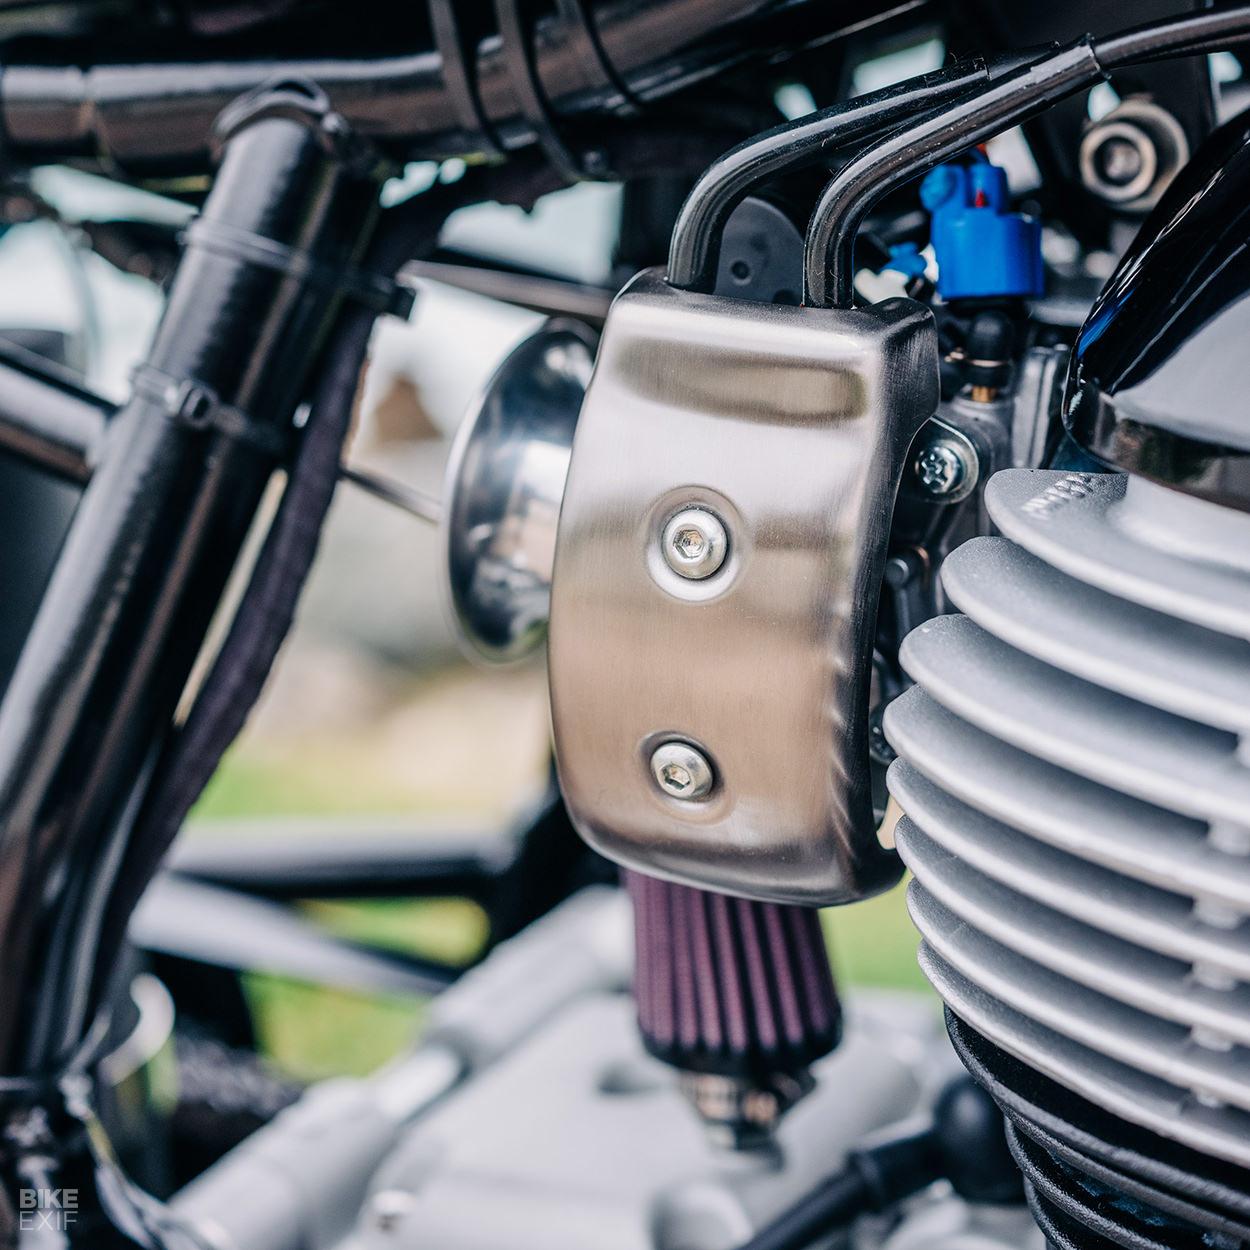 Royal Enfield Continental GT drag bike by Sinroja